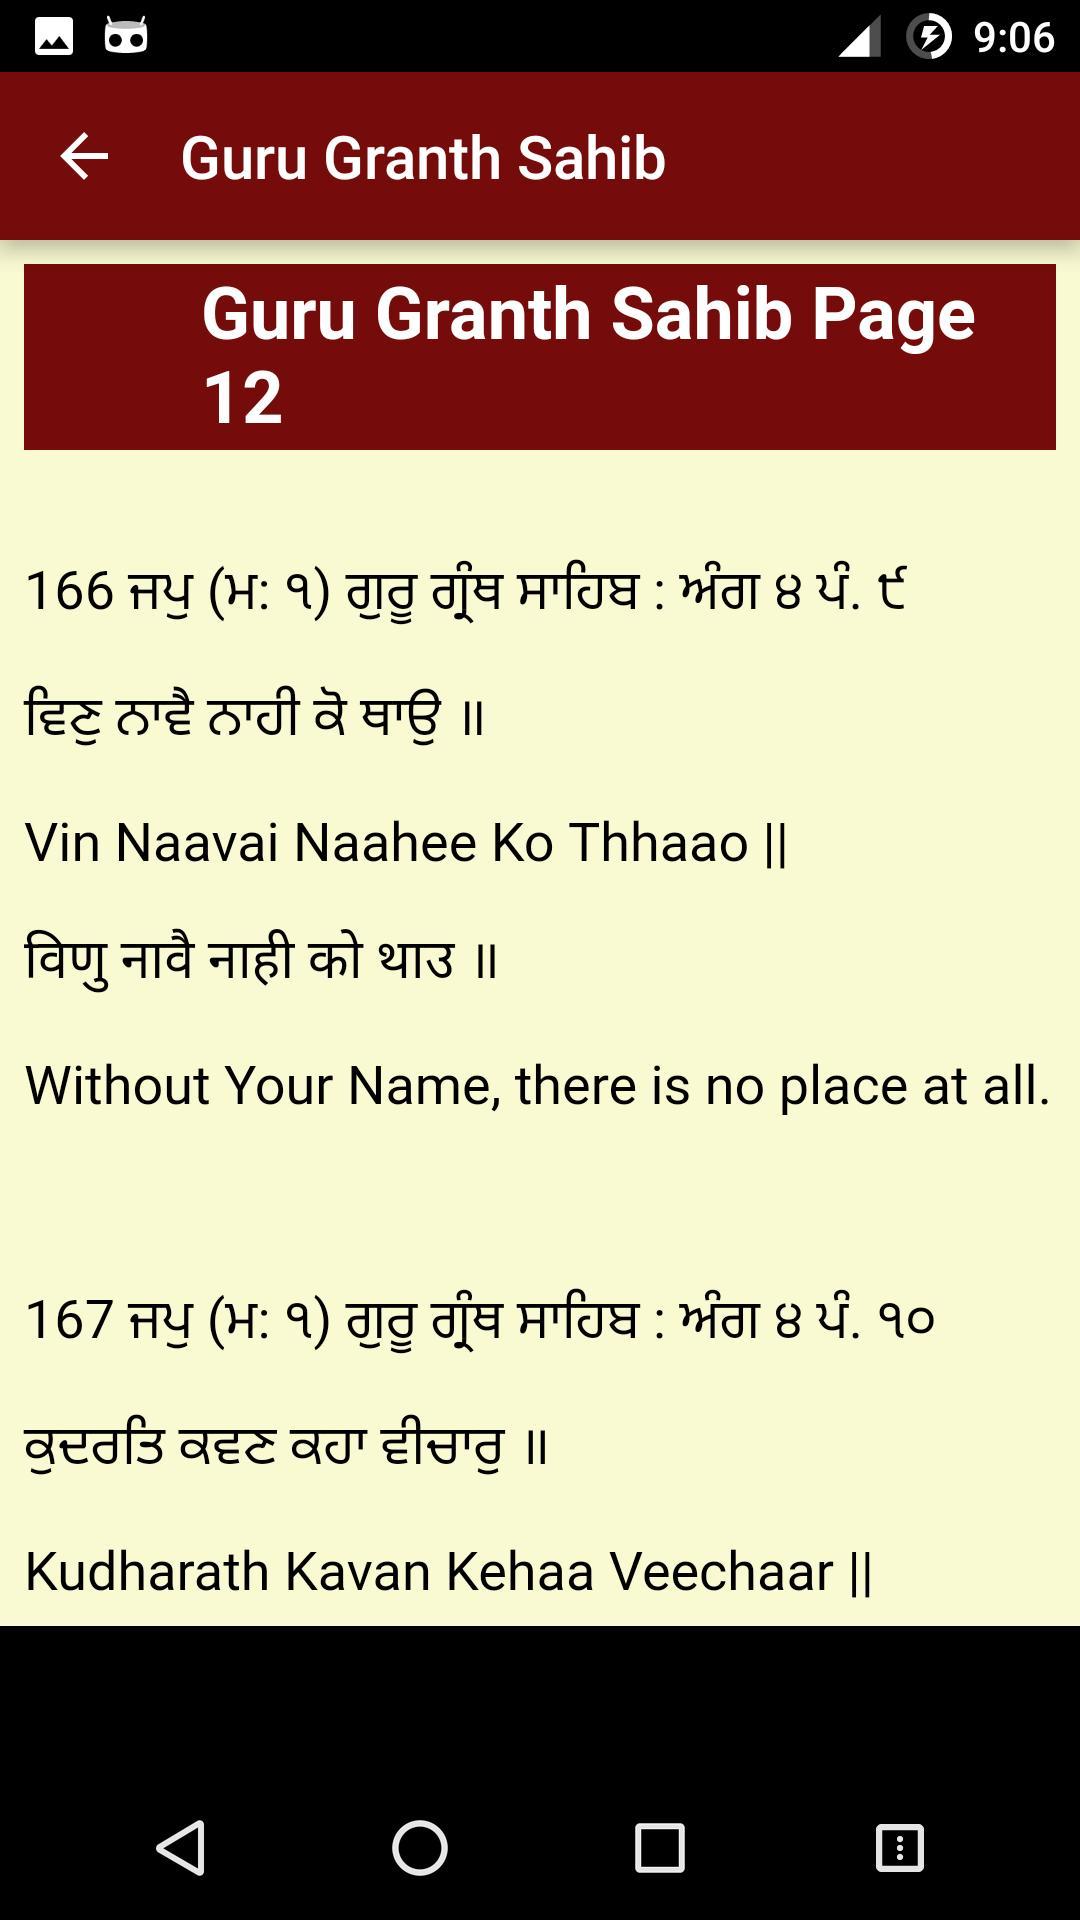 Sri Guru Granth Sahib Ji Punjabi   Hindi   English for Android - APK  Download